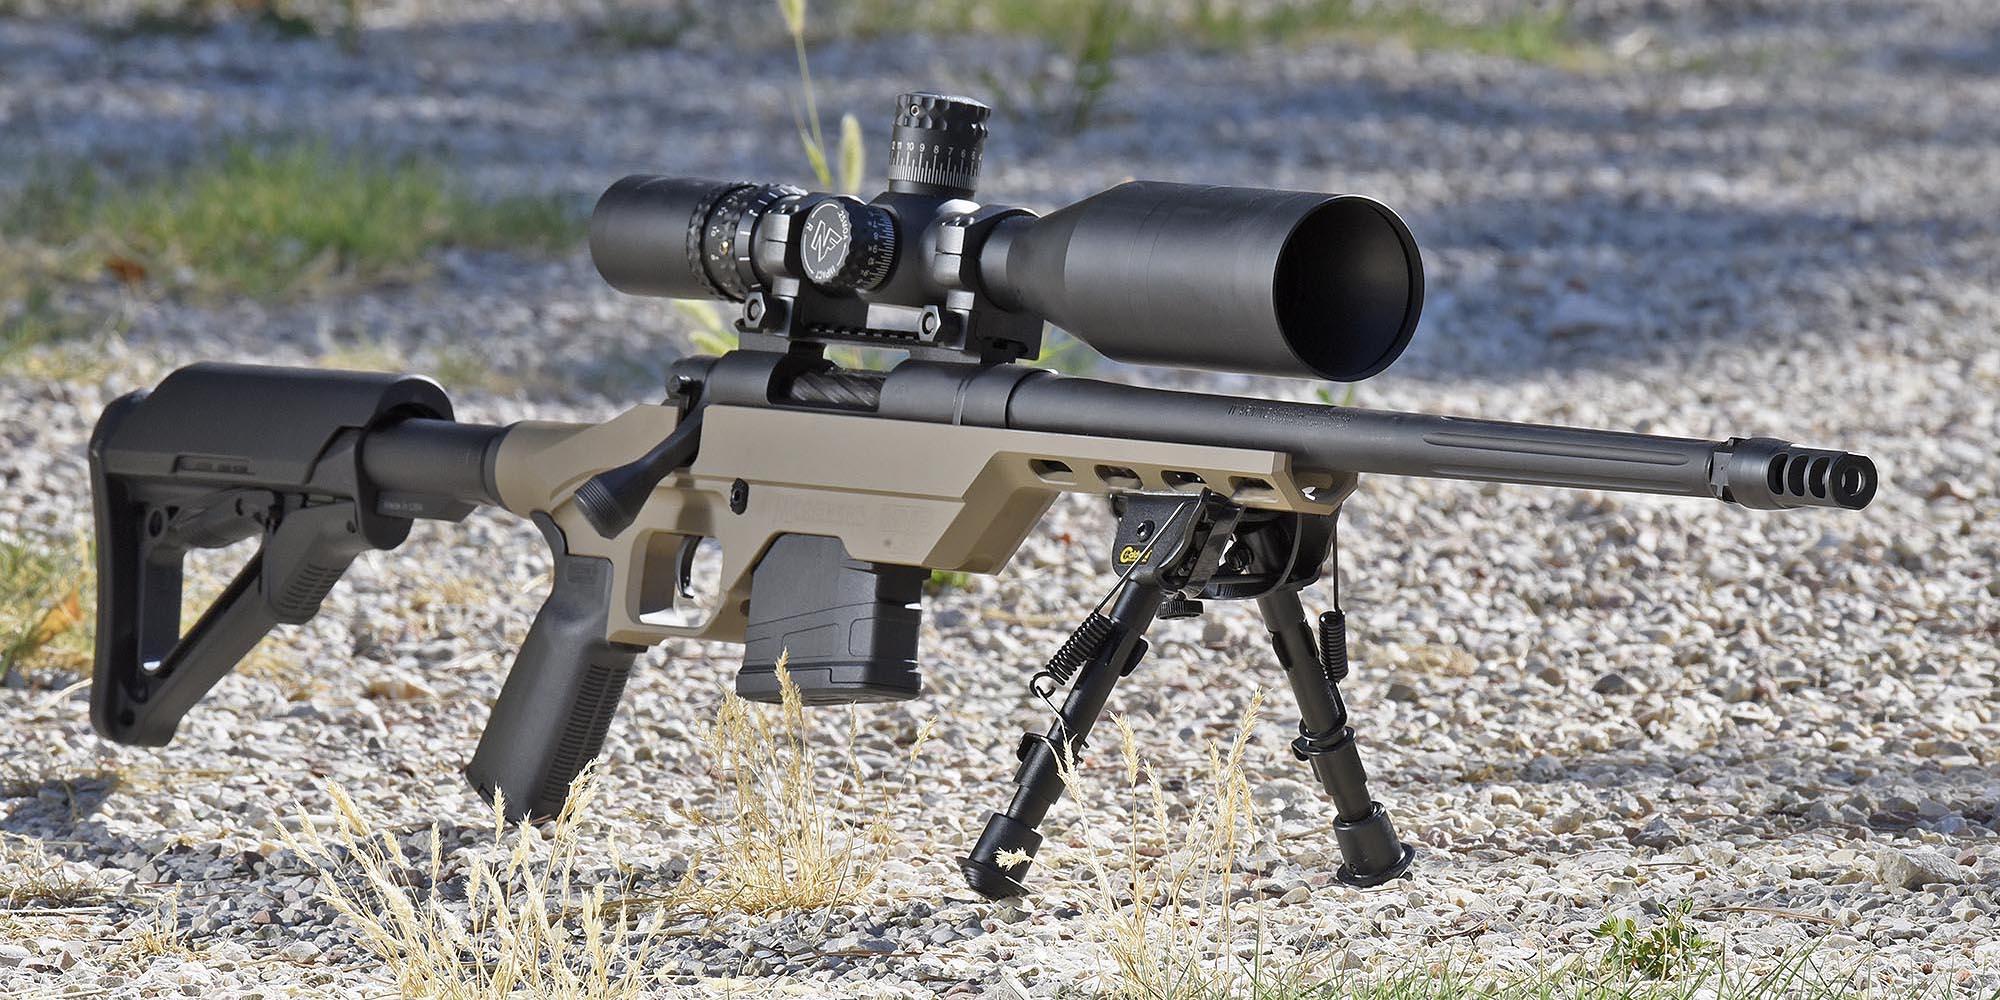 Mossberg Mvp Lc Rifle Gunsweek